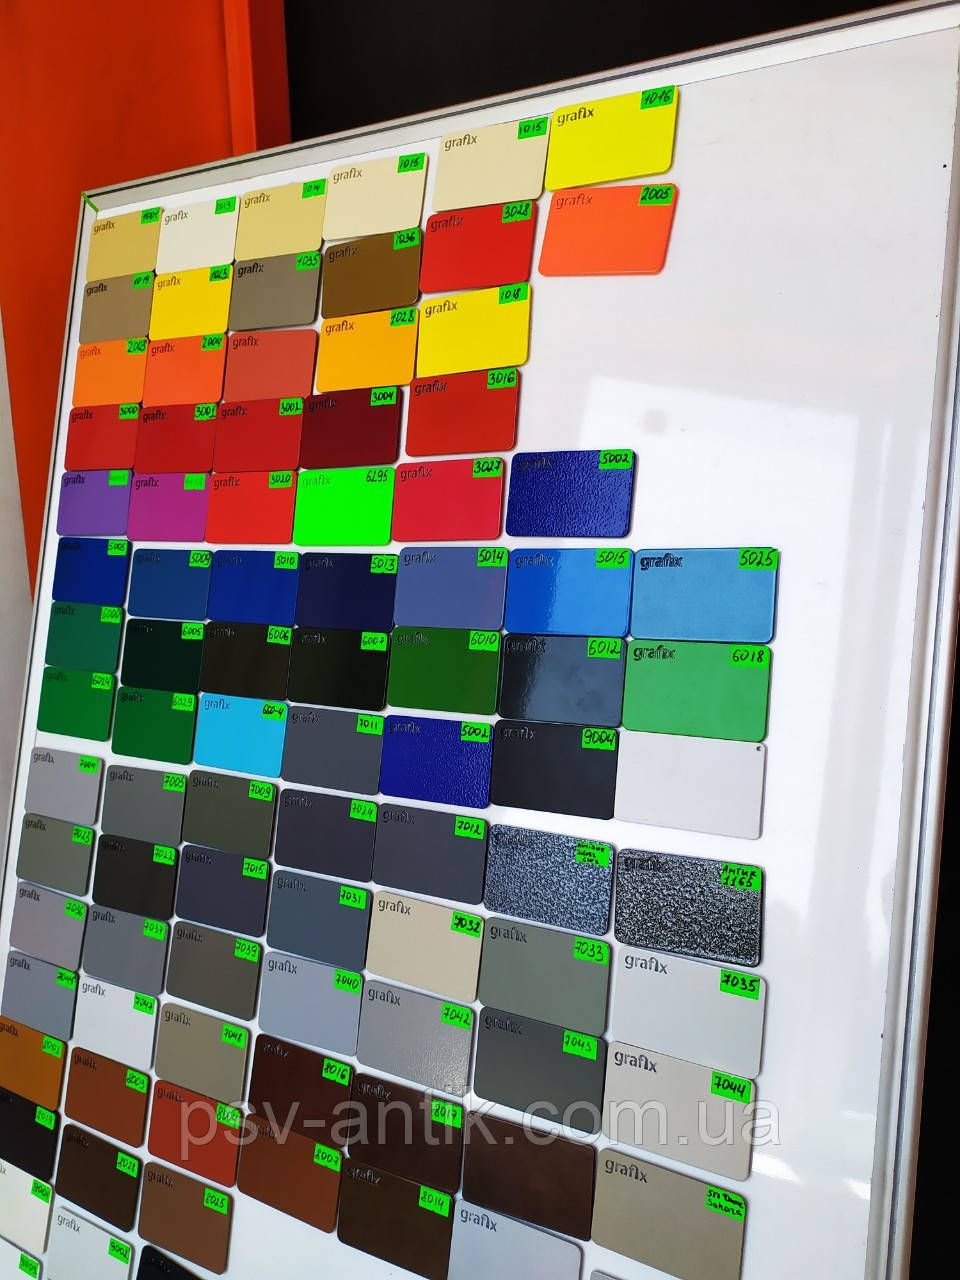 Порошковая краска глянцевая, полиэфирная, архитектурная, 6026